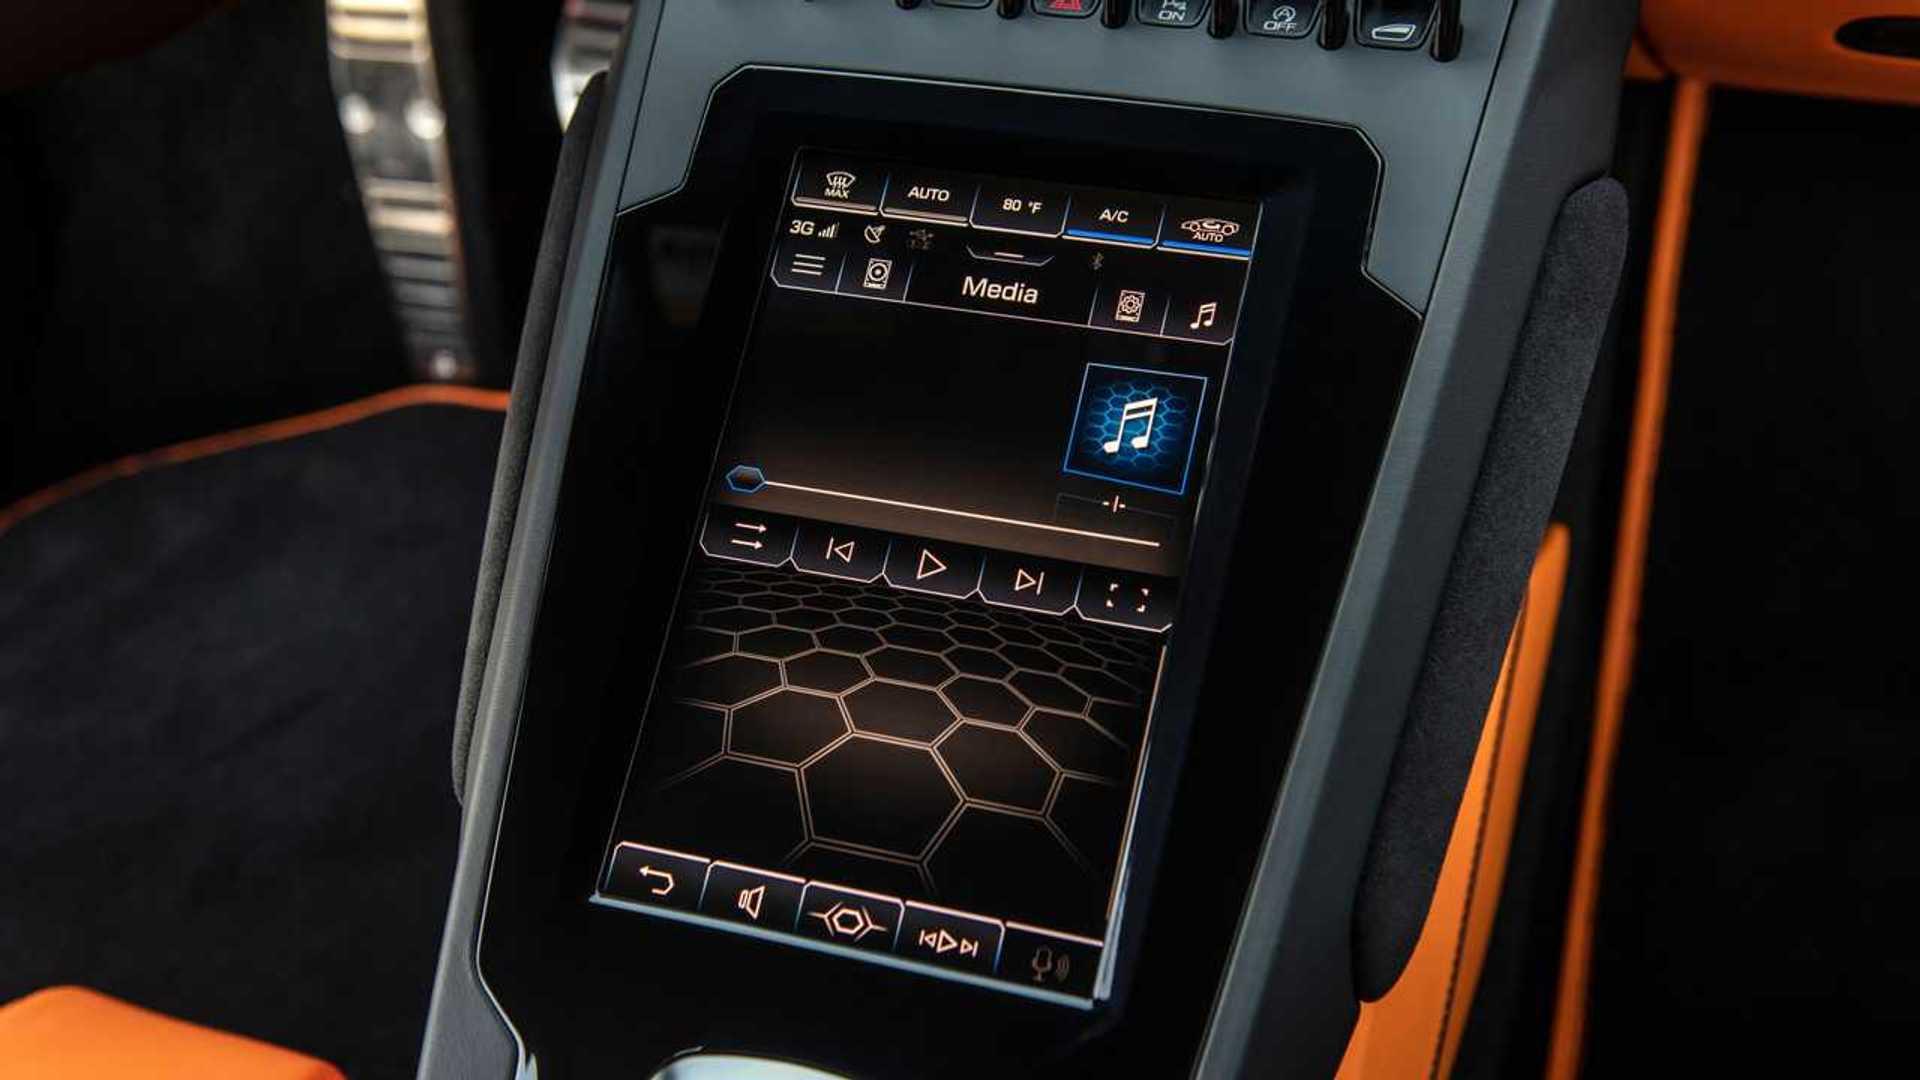 2020 Lamborghini Huracan Evo RWD infotainment